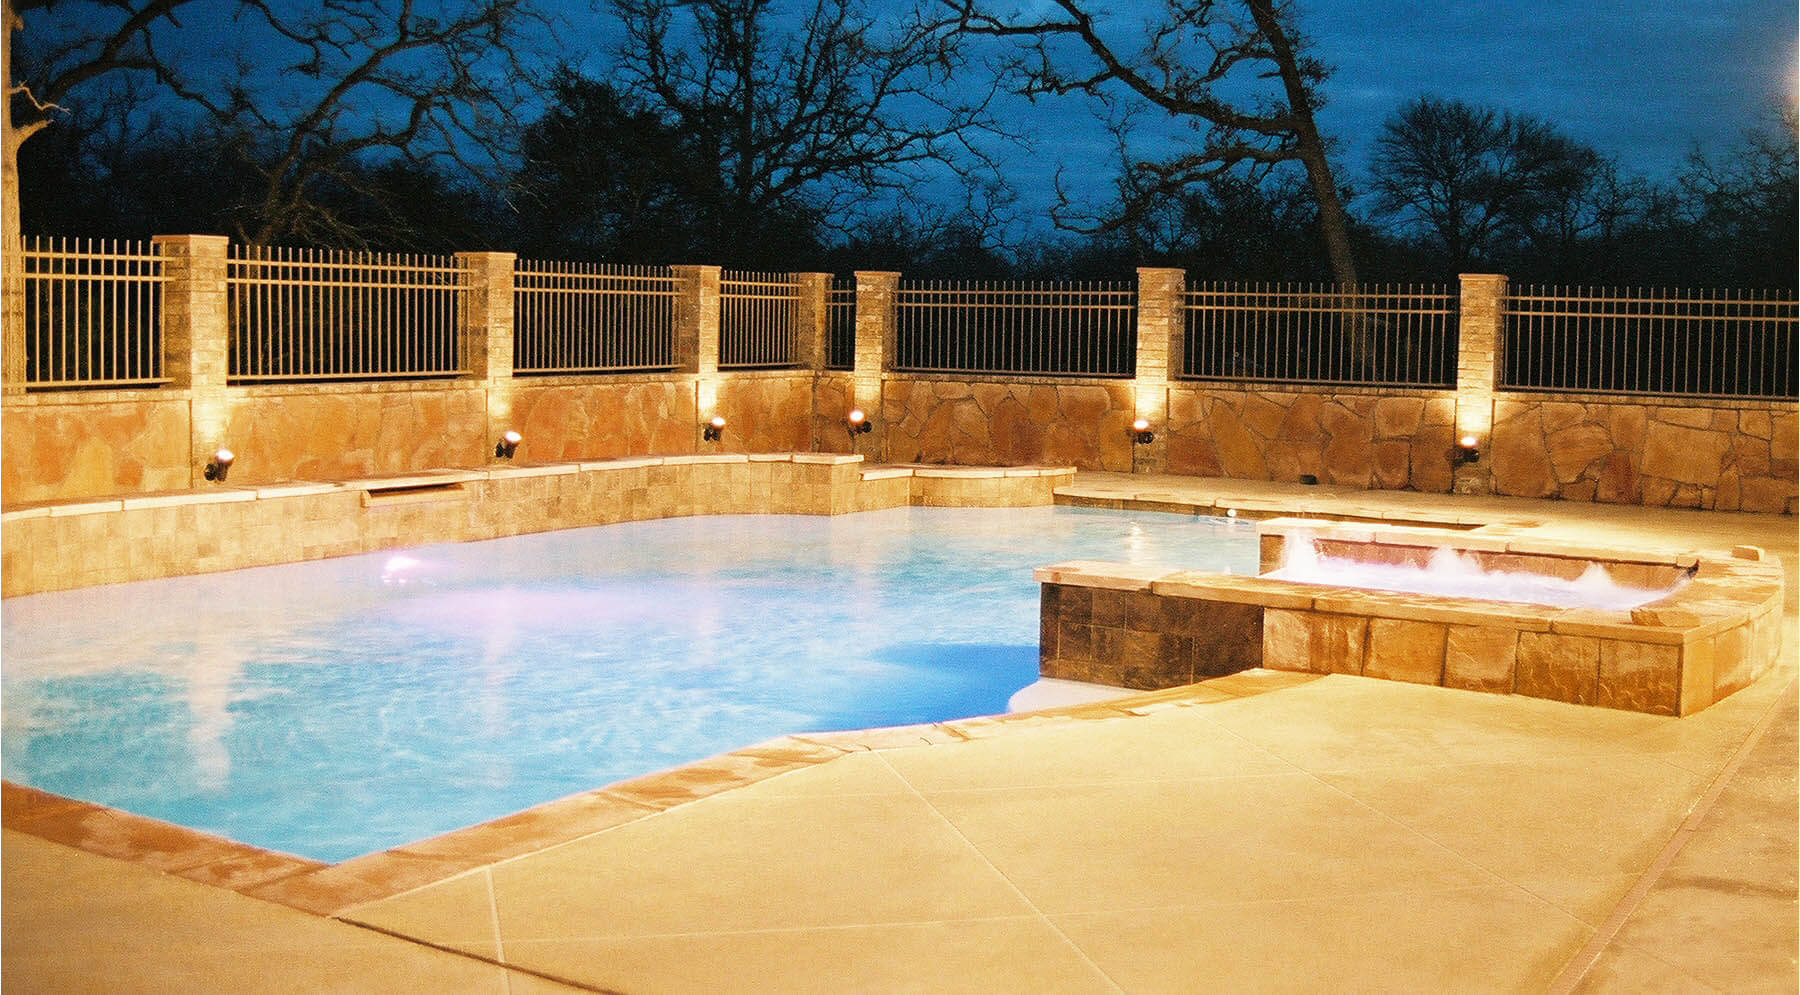 Keys to modern swimming pool design sunshine fun pools for Pool design sunshine coast